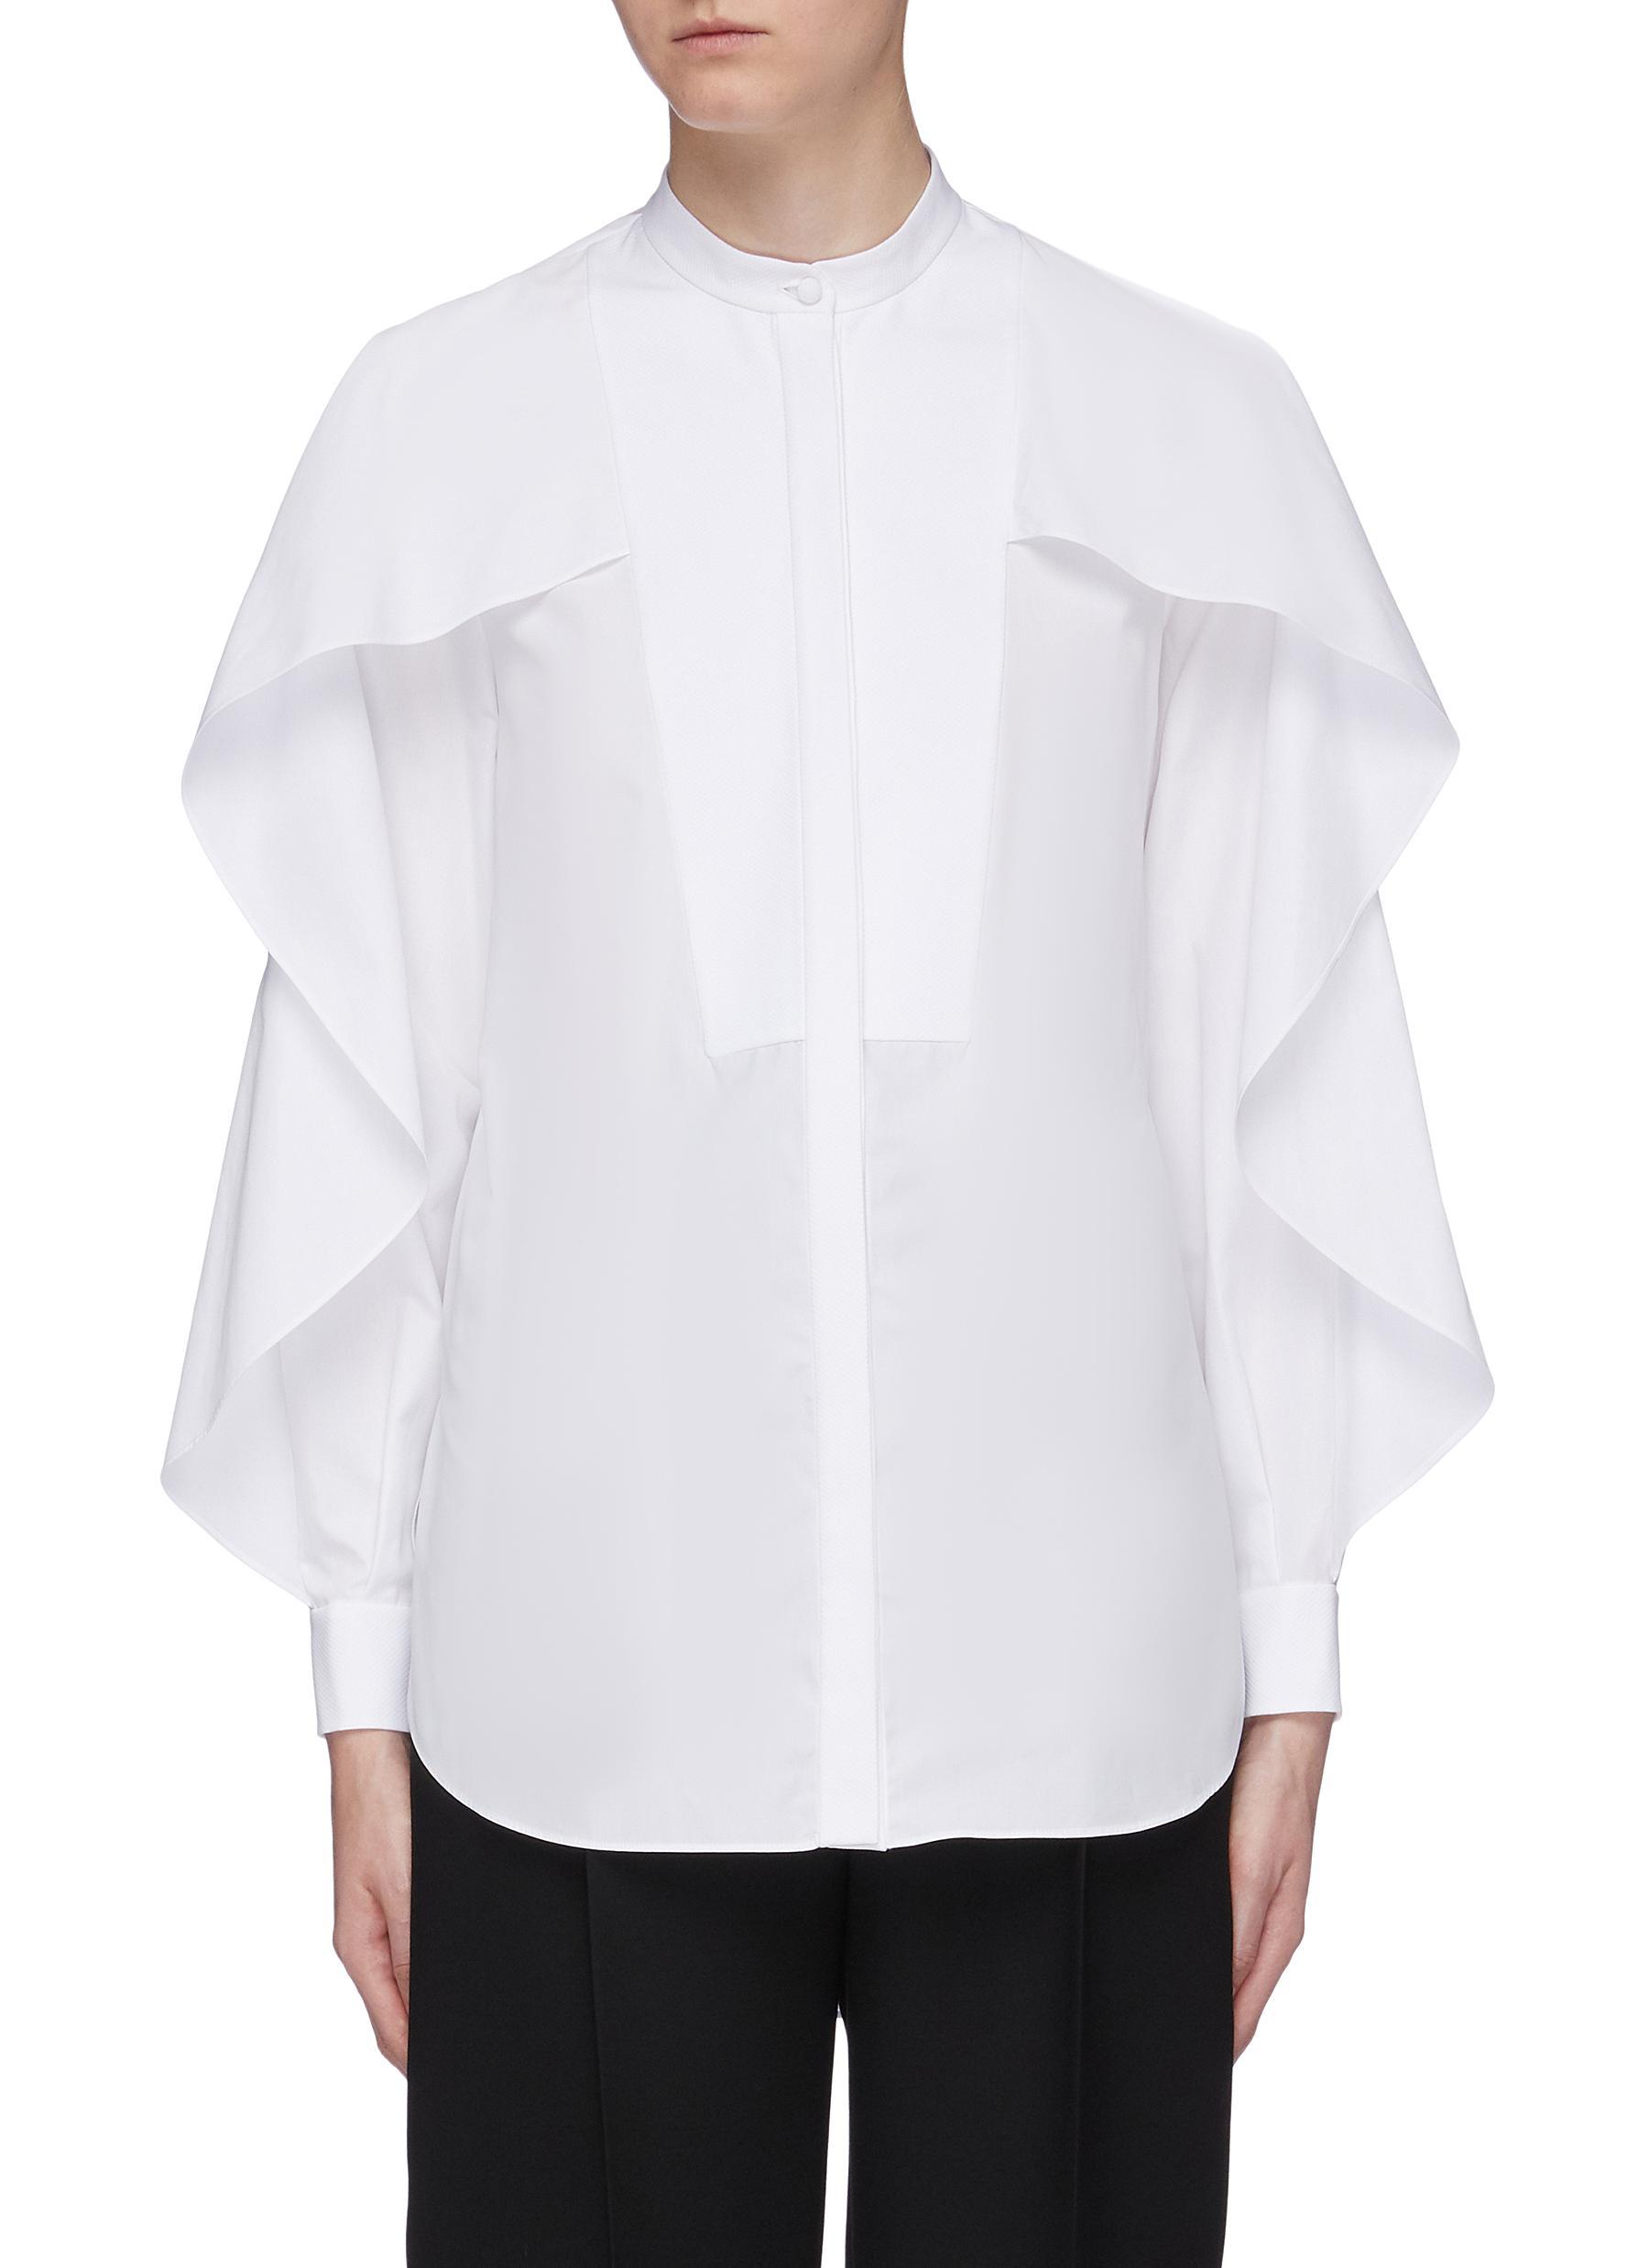 Layered ruffle sleeve bib shirt by Alexander Mcqueen